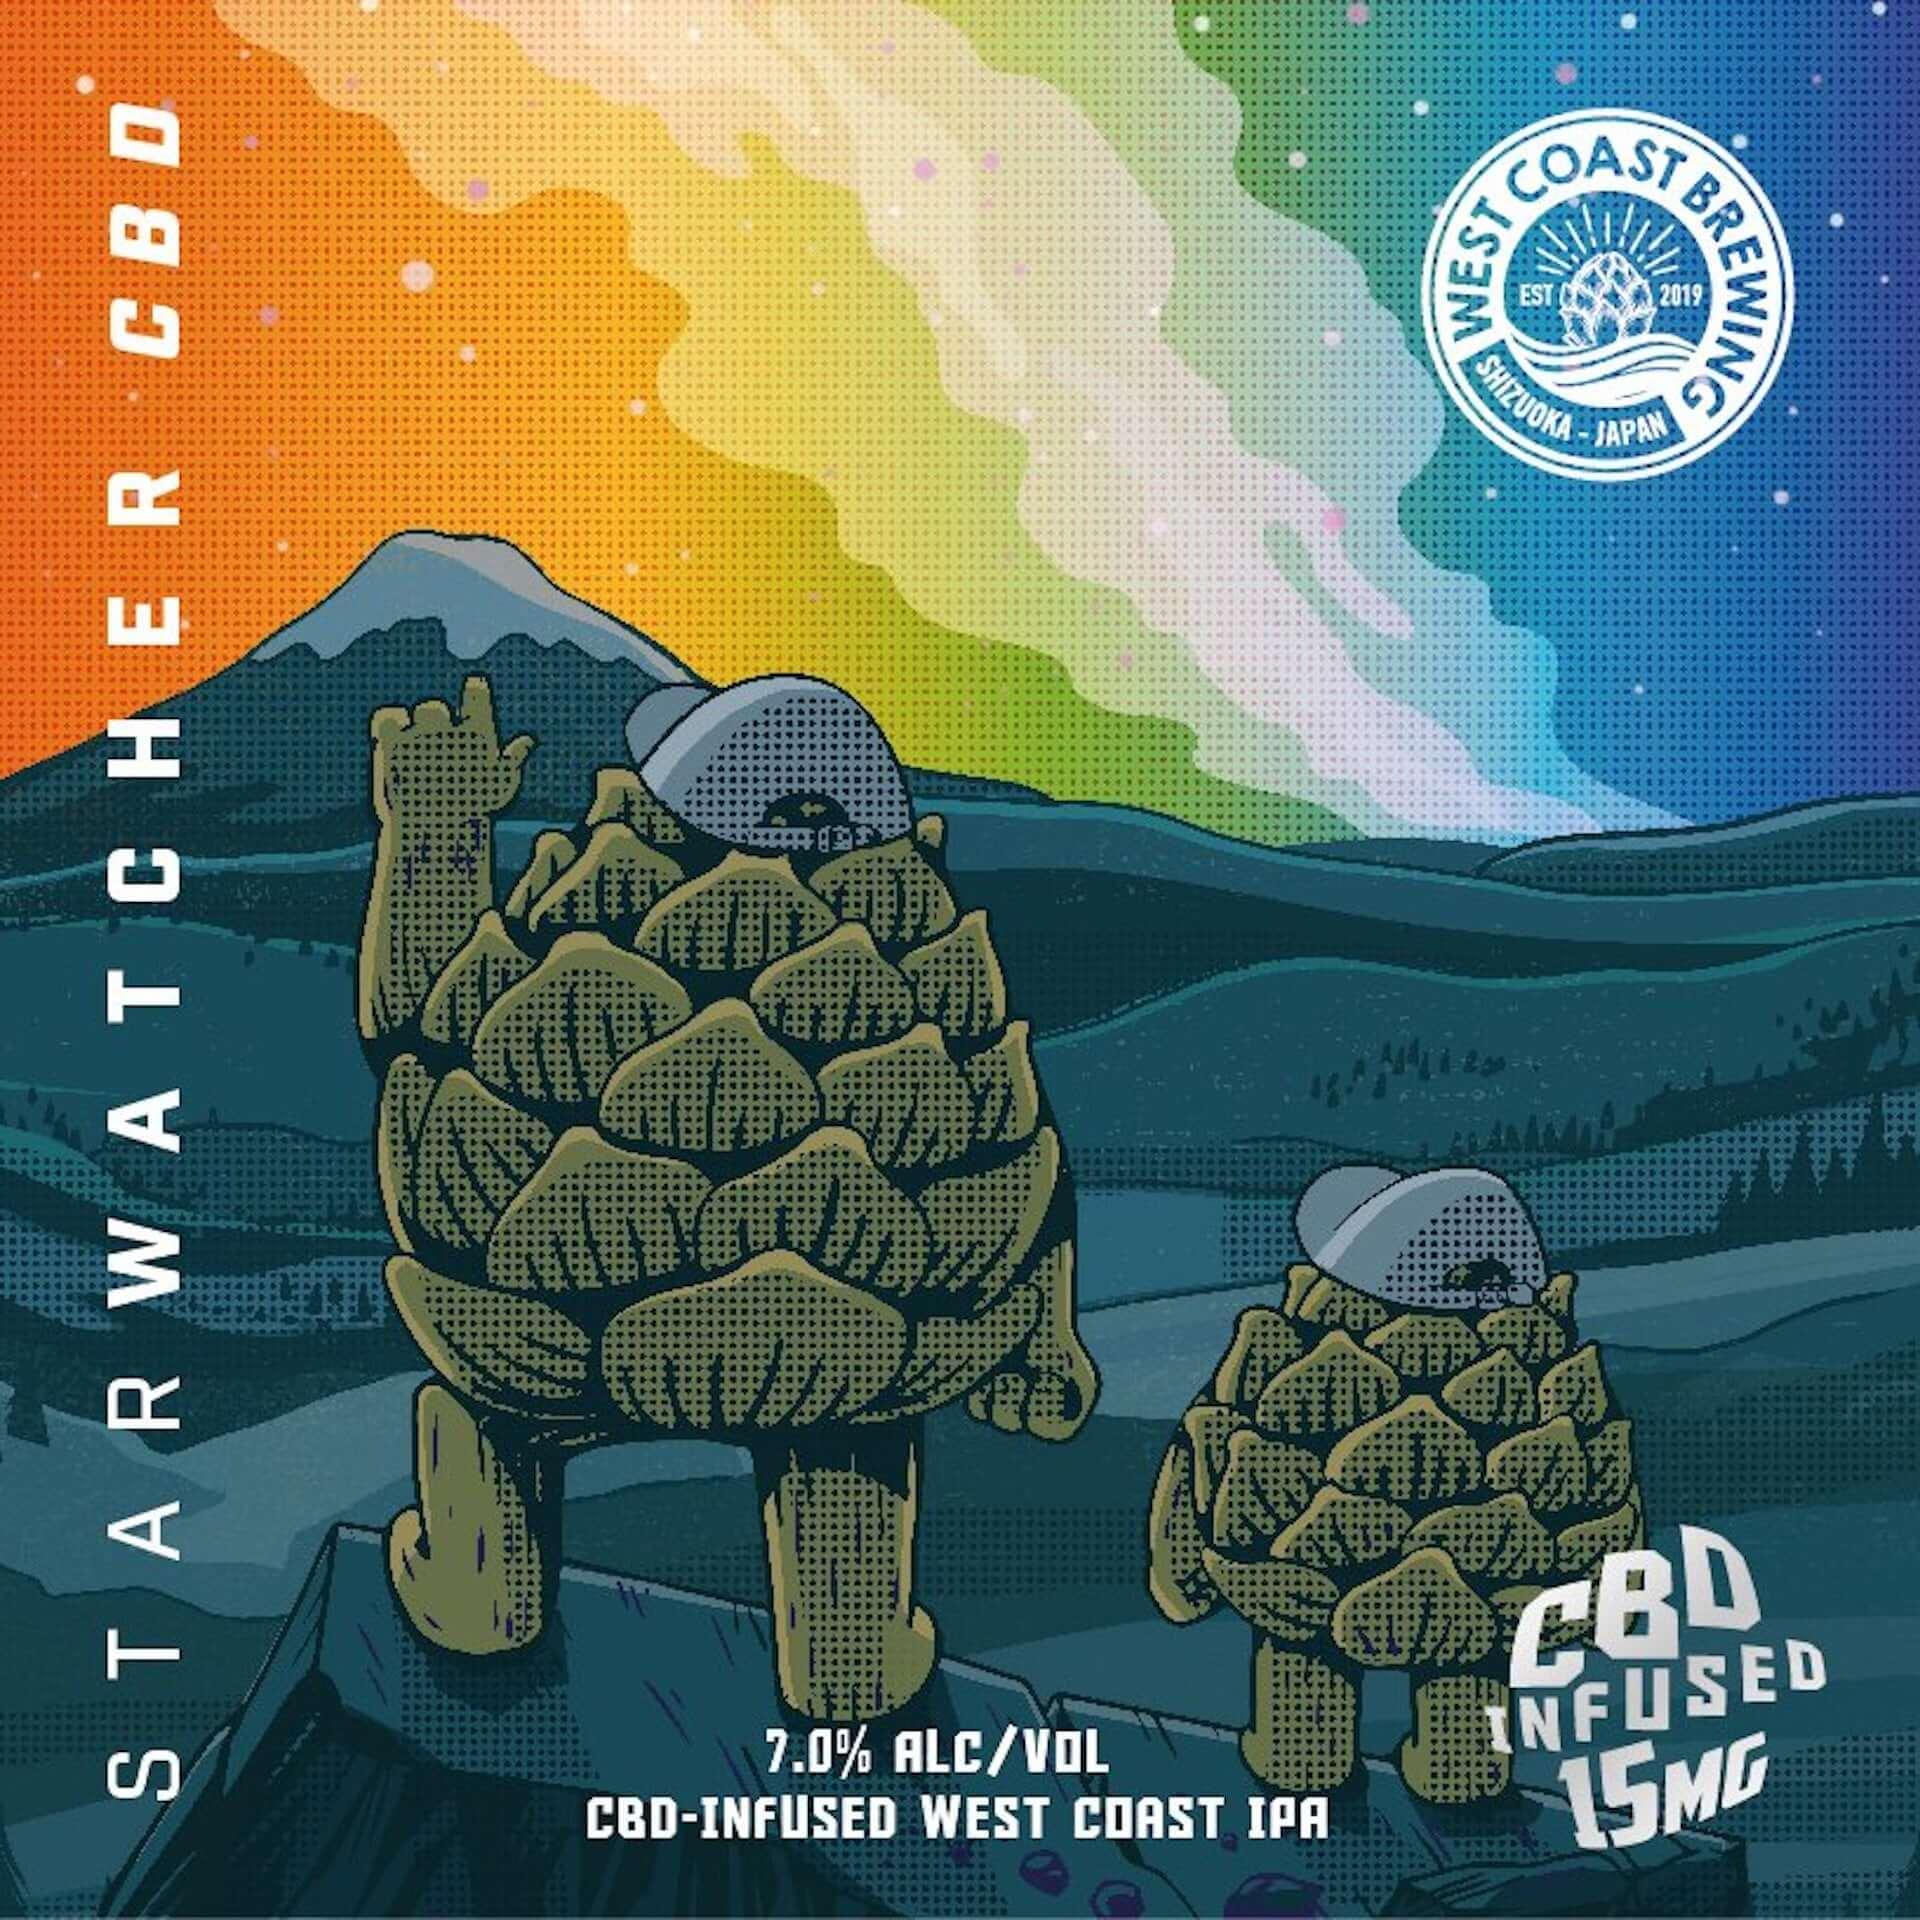 CBD入りクラフトビール『Starwatcher CBD』と『Green Light』がWest Coast Brewingより発売!香り豊かなIPAを採用 gourmet210302_westcoastbrewing_4-1920x1920